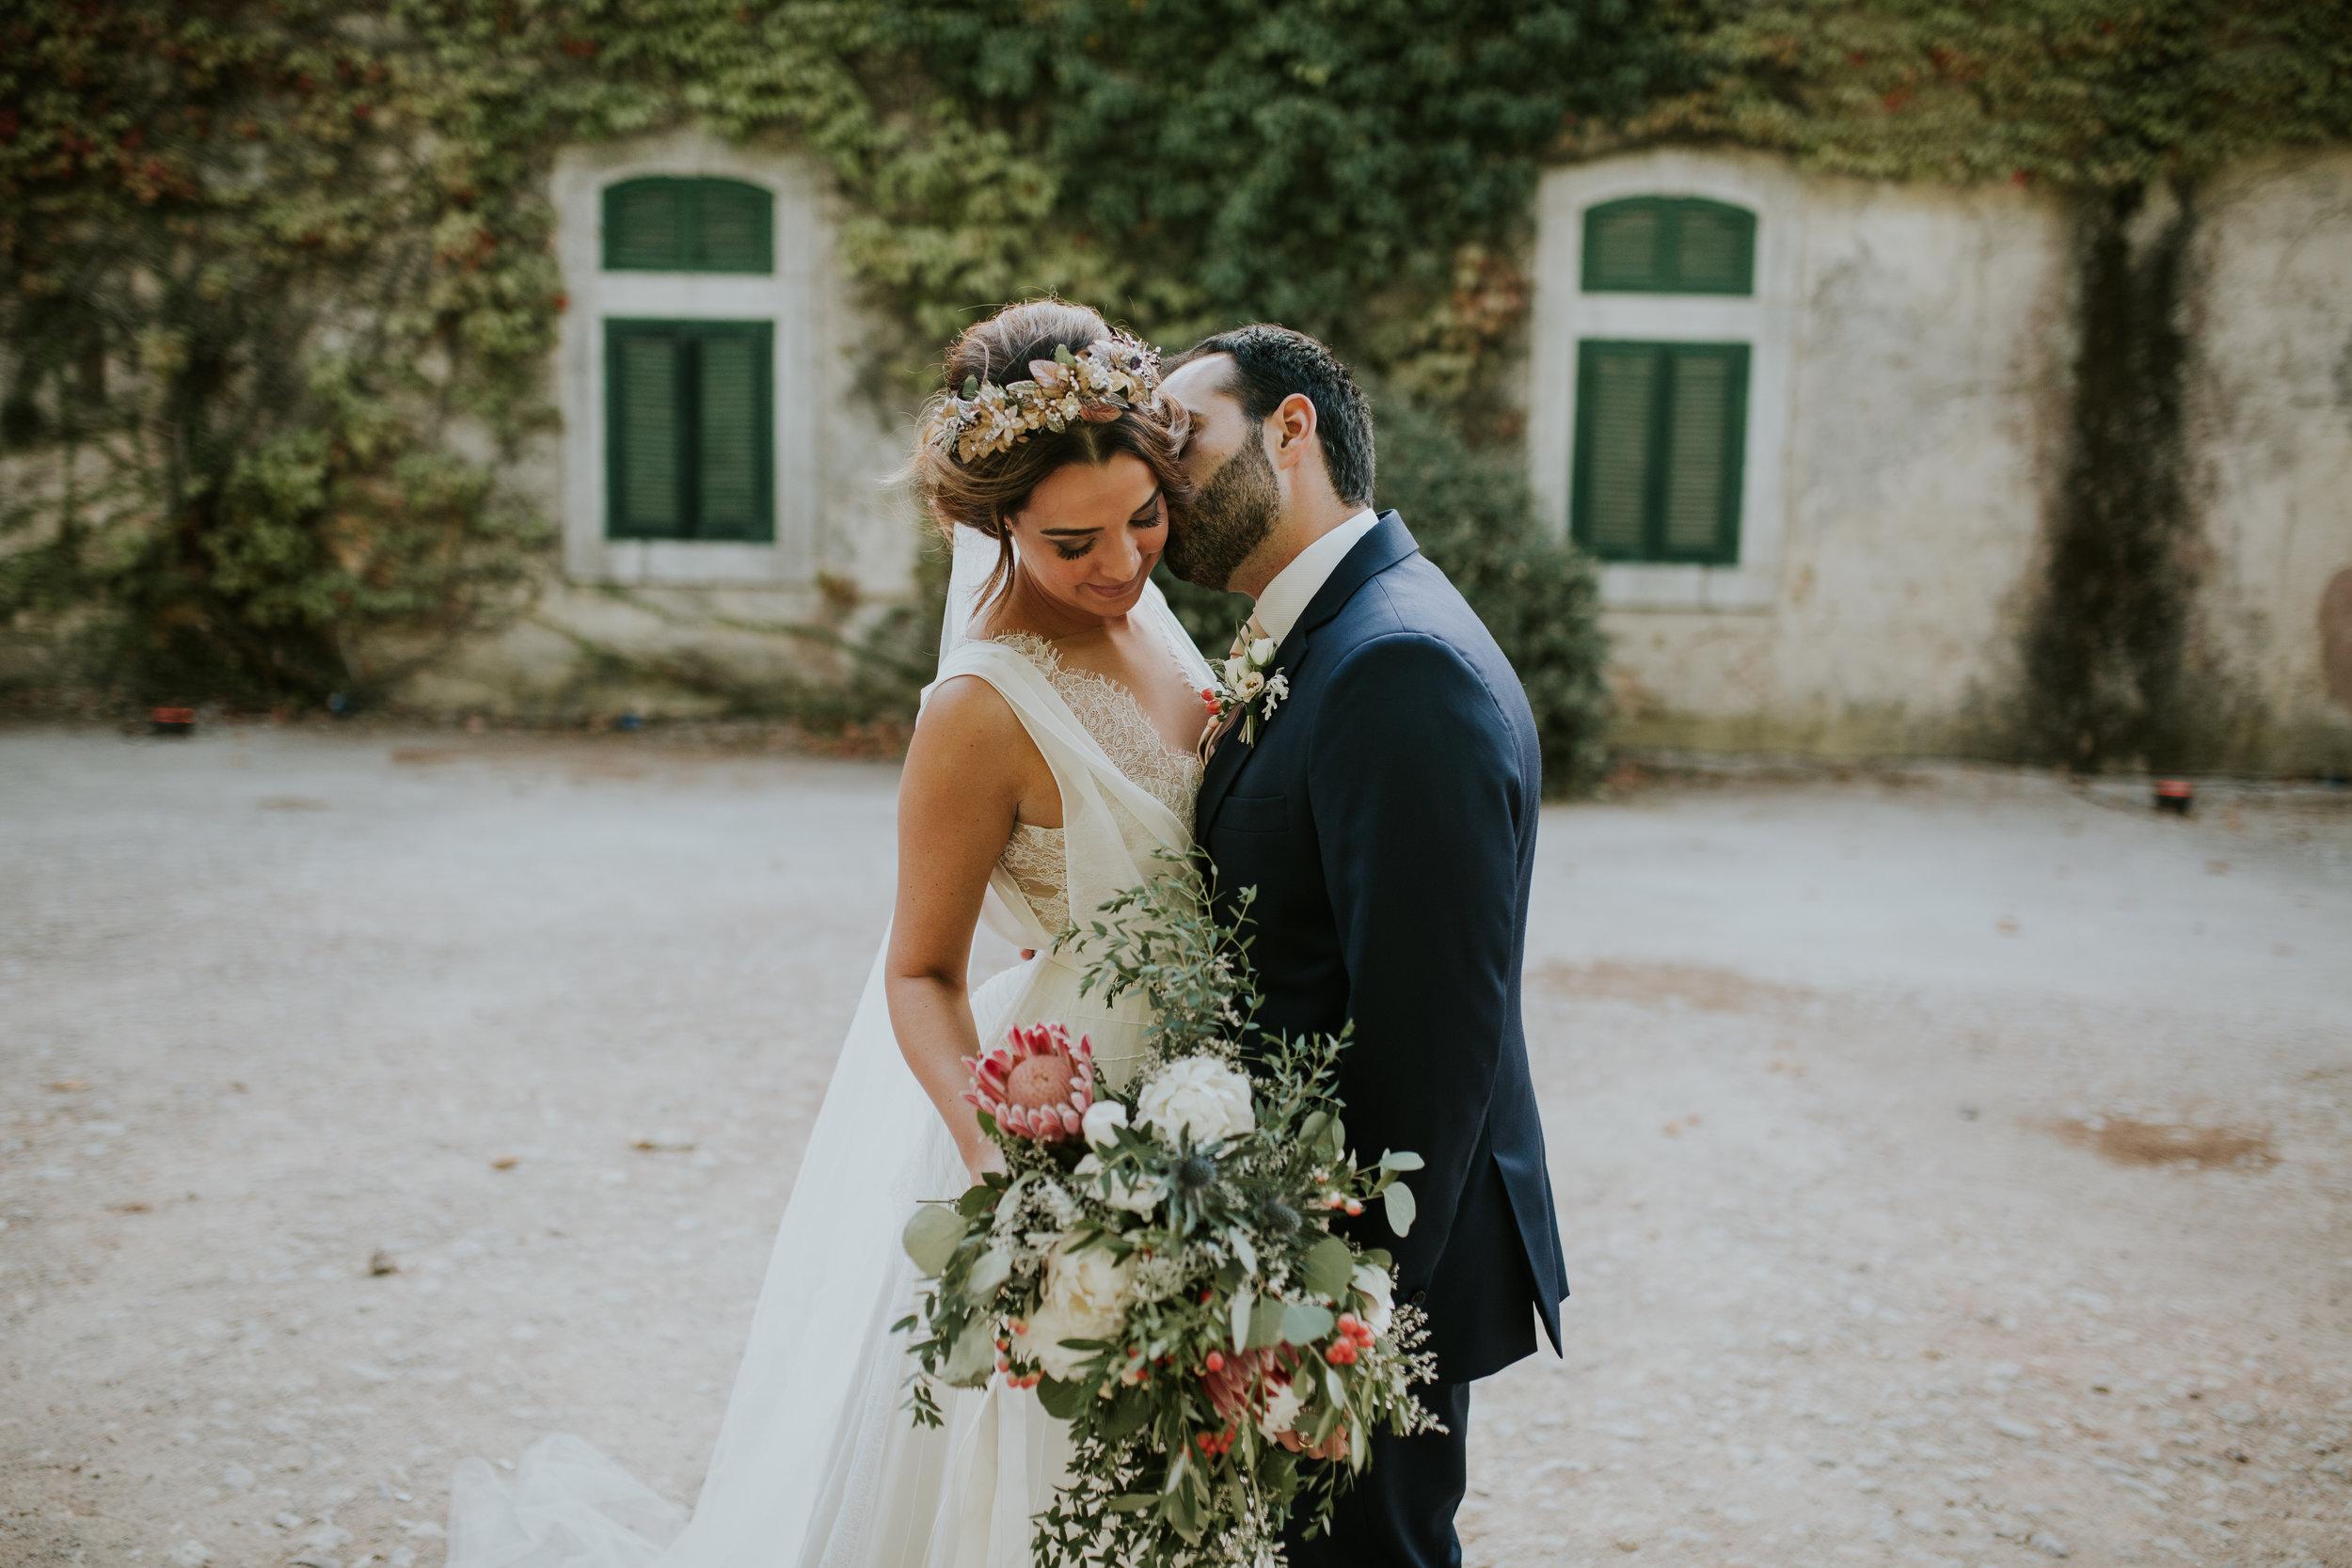 R&J415_ 09 setembro 2017 Wedding day_.jpg